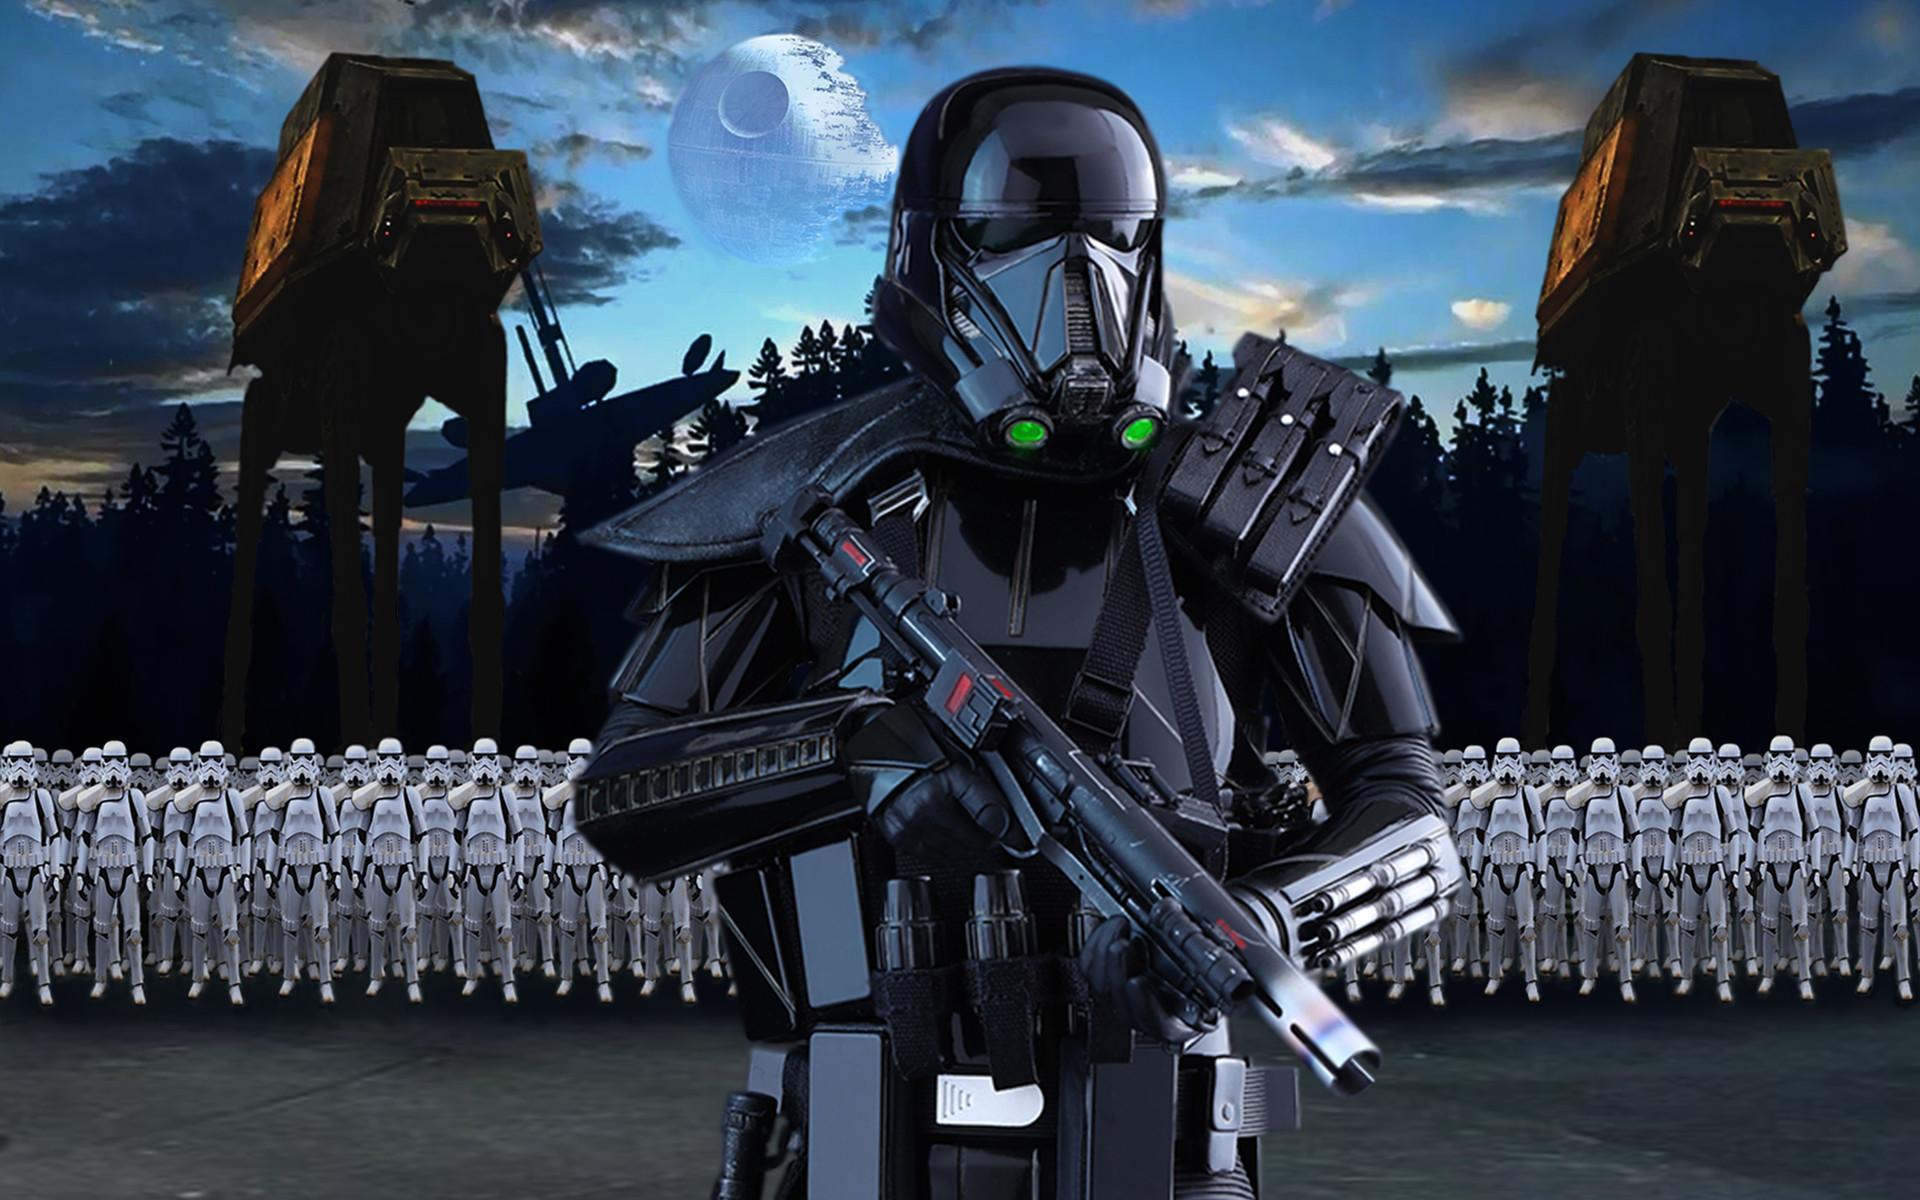 ArtStation - Star Wars Rogue One